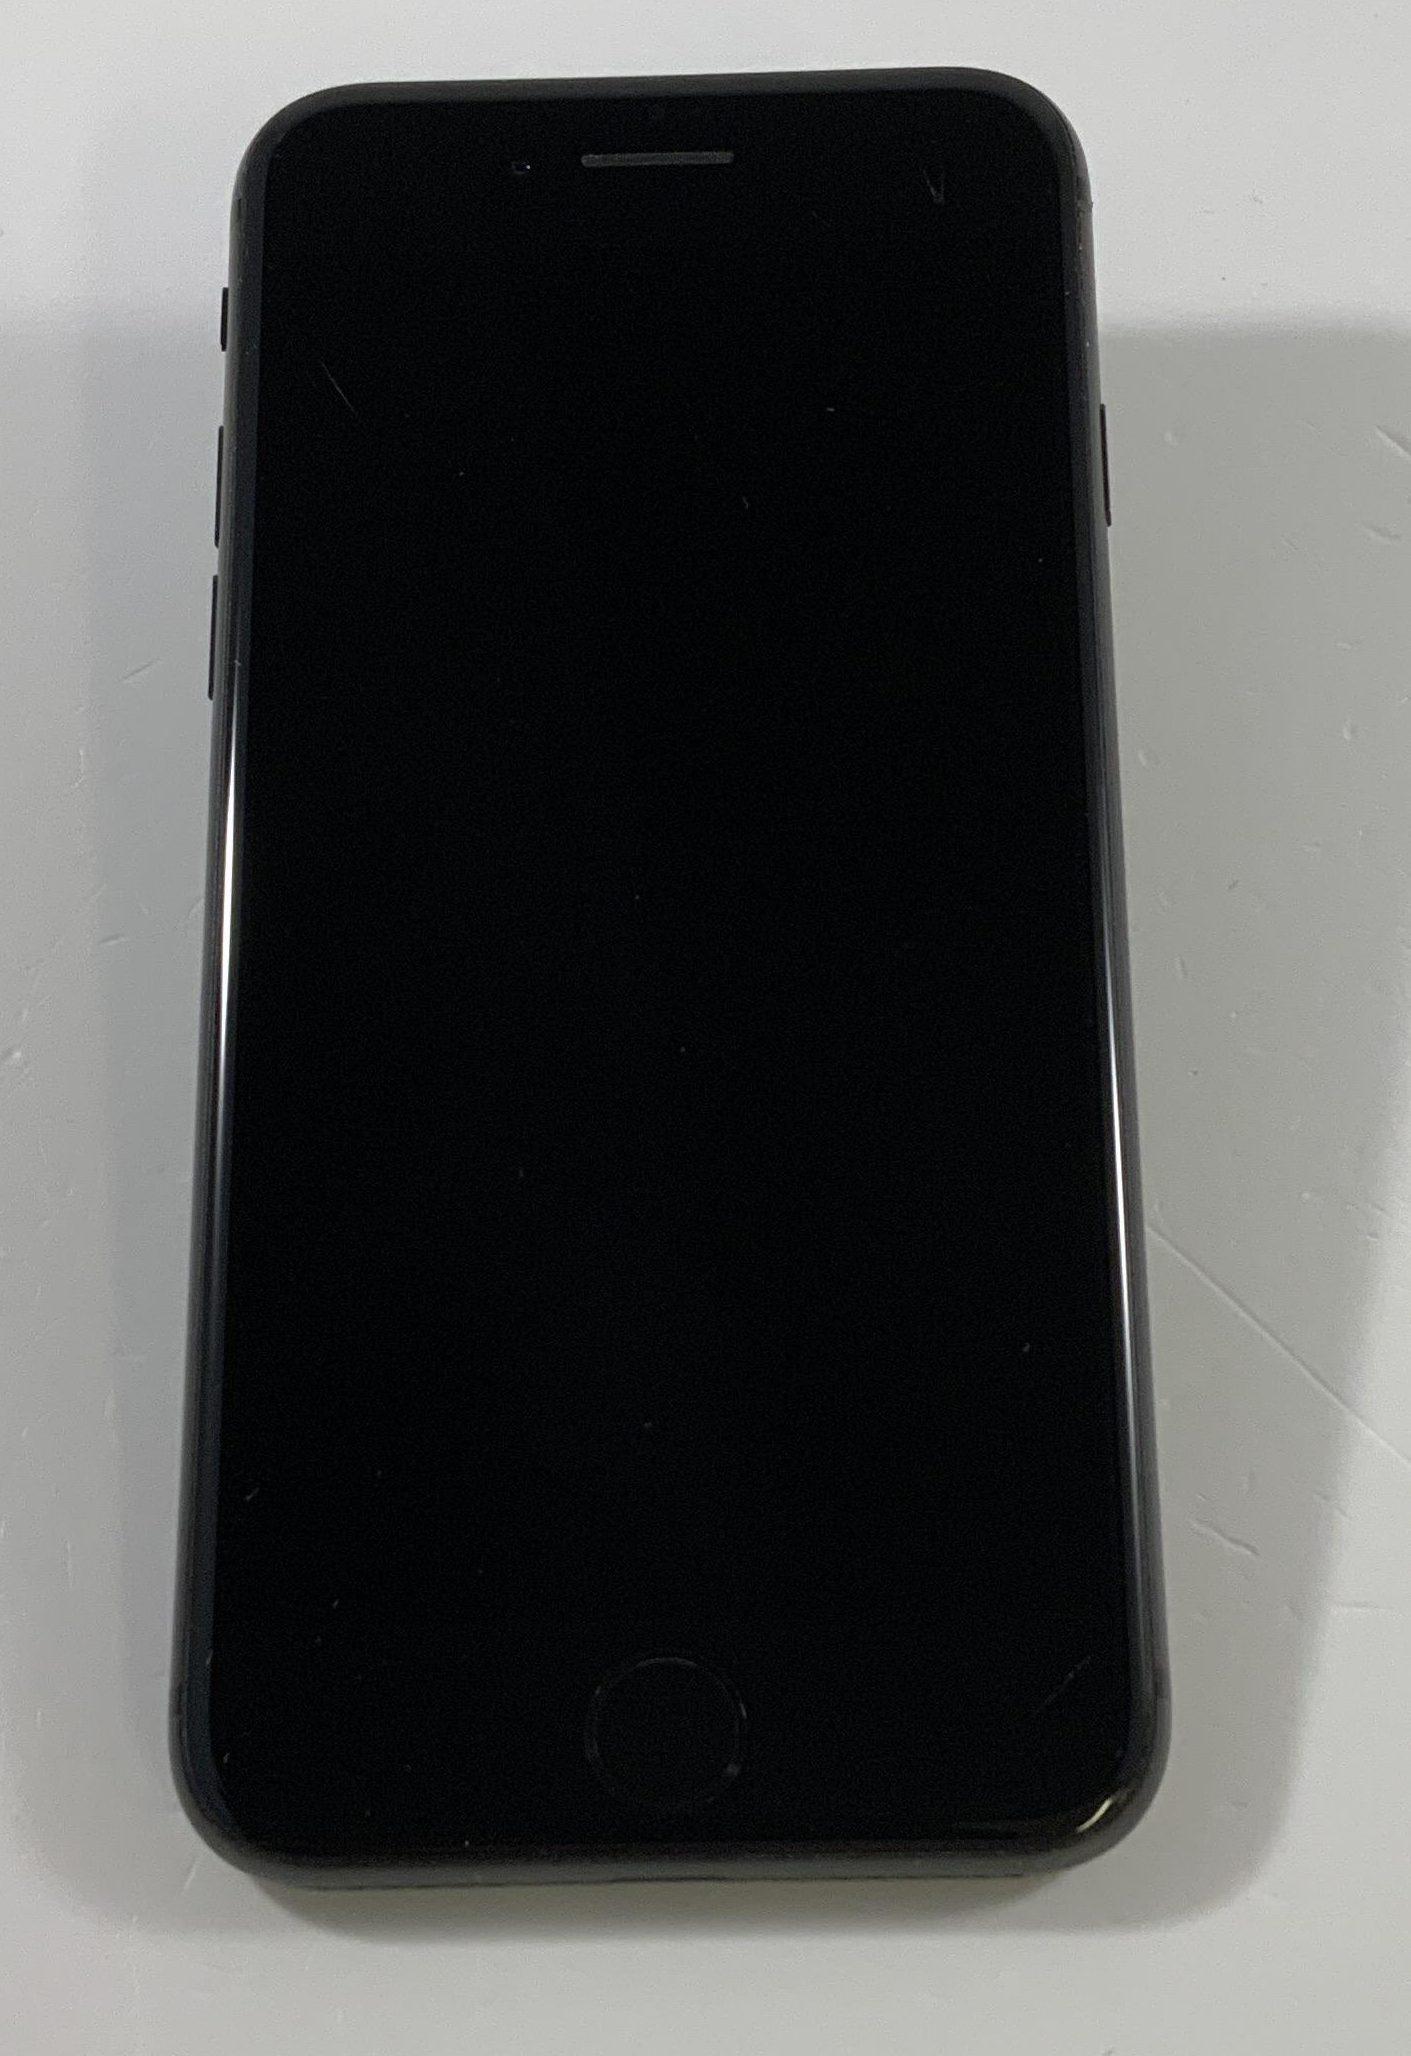 iPhone 8 64GB, 64GB, Space Gray, Afbeelding 1